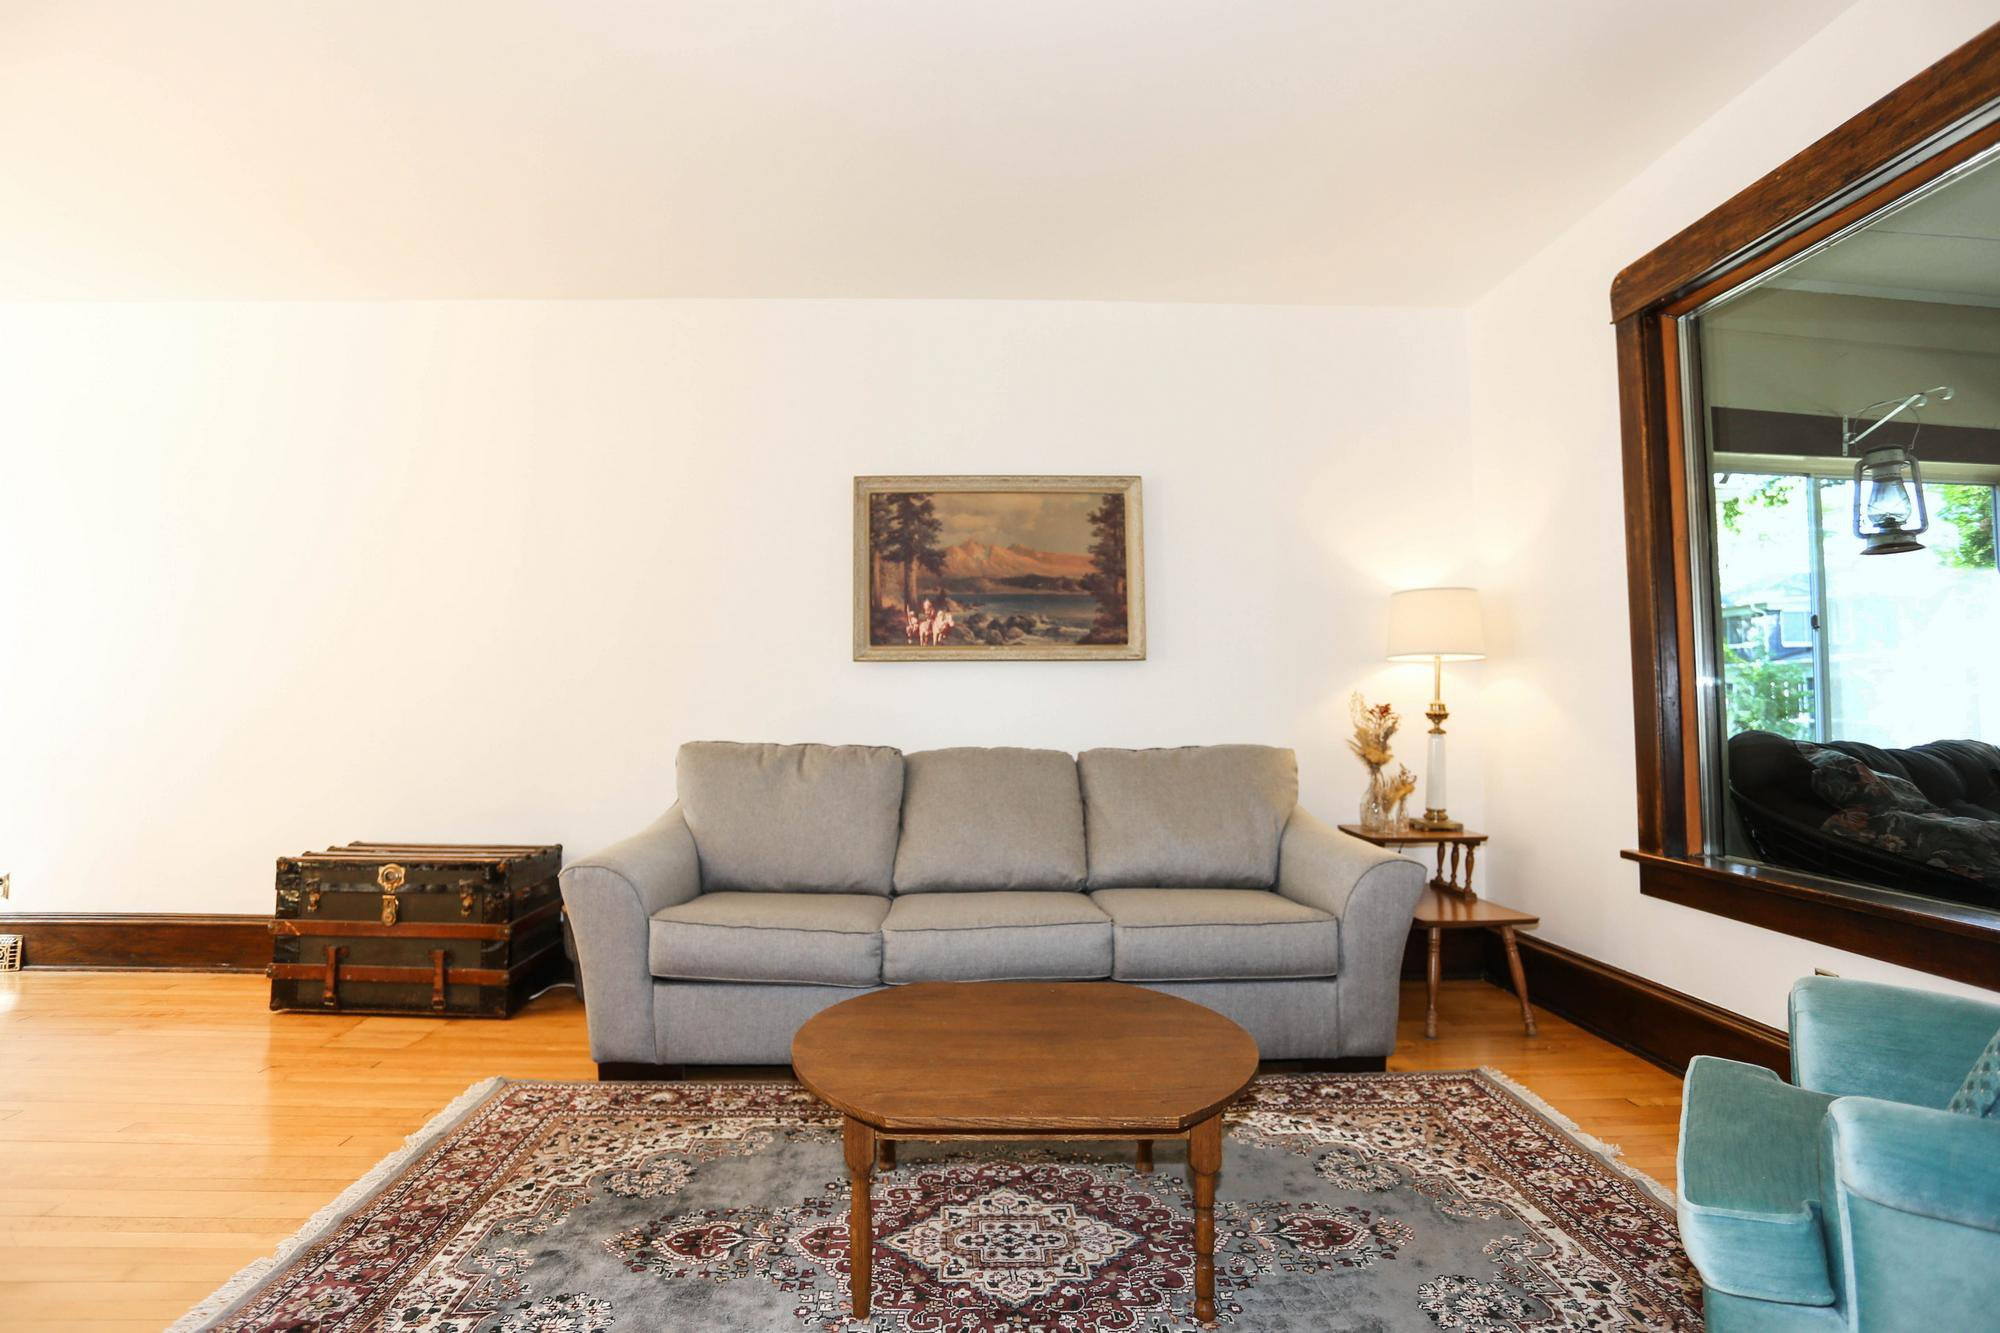 Photo 8: Photos: 105 Evanson Street in Winnipeg: Wolseley Single Family Detached for sale (5B)  : MLS®# 1821900